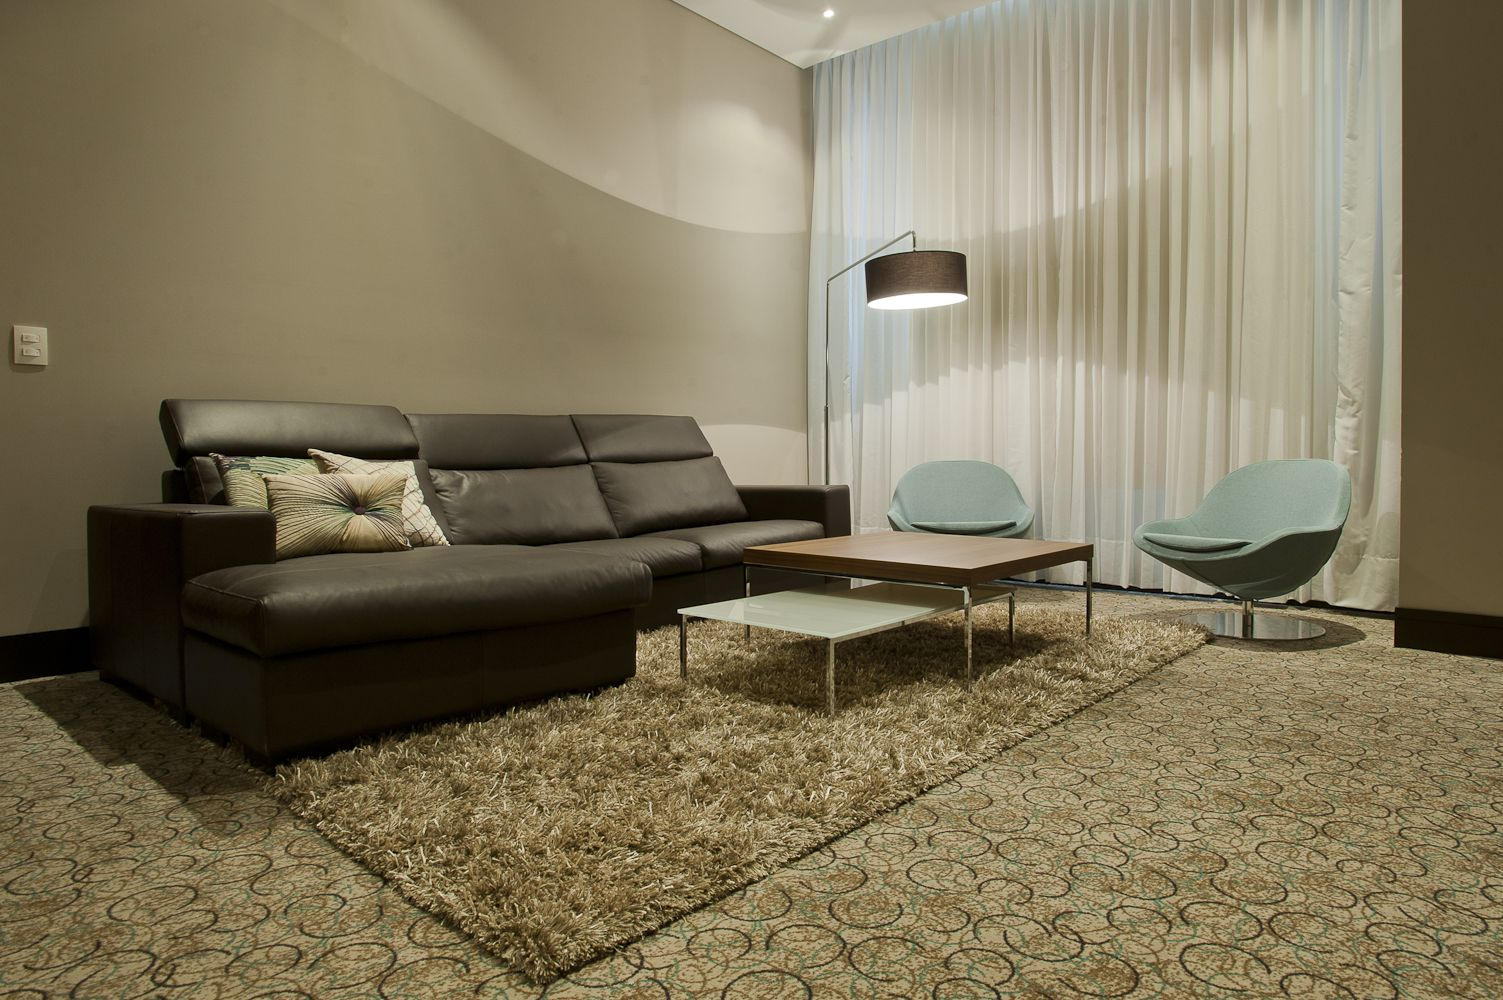 Boconcept Nago Sofa Veneto Chairs Lugo Coffee Tables And Shower Mega Lamp At Hotel Cosmos